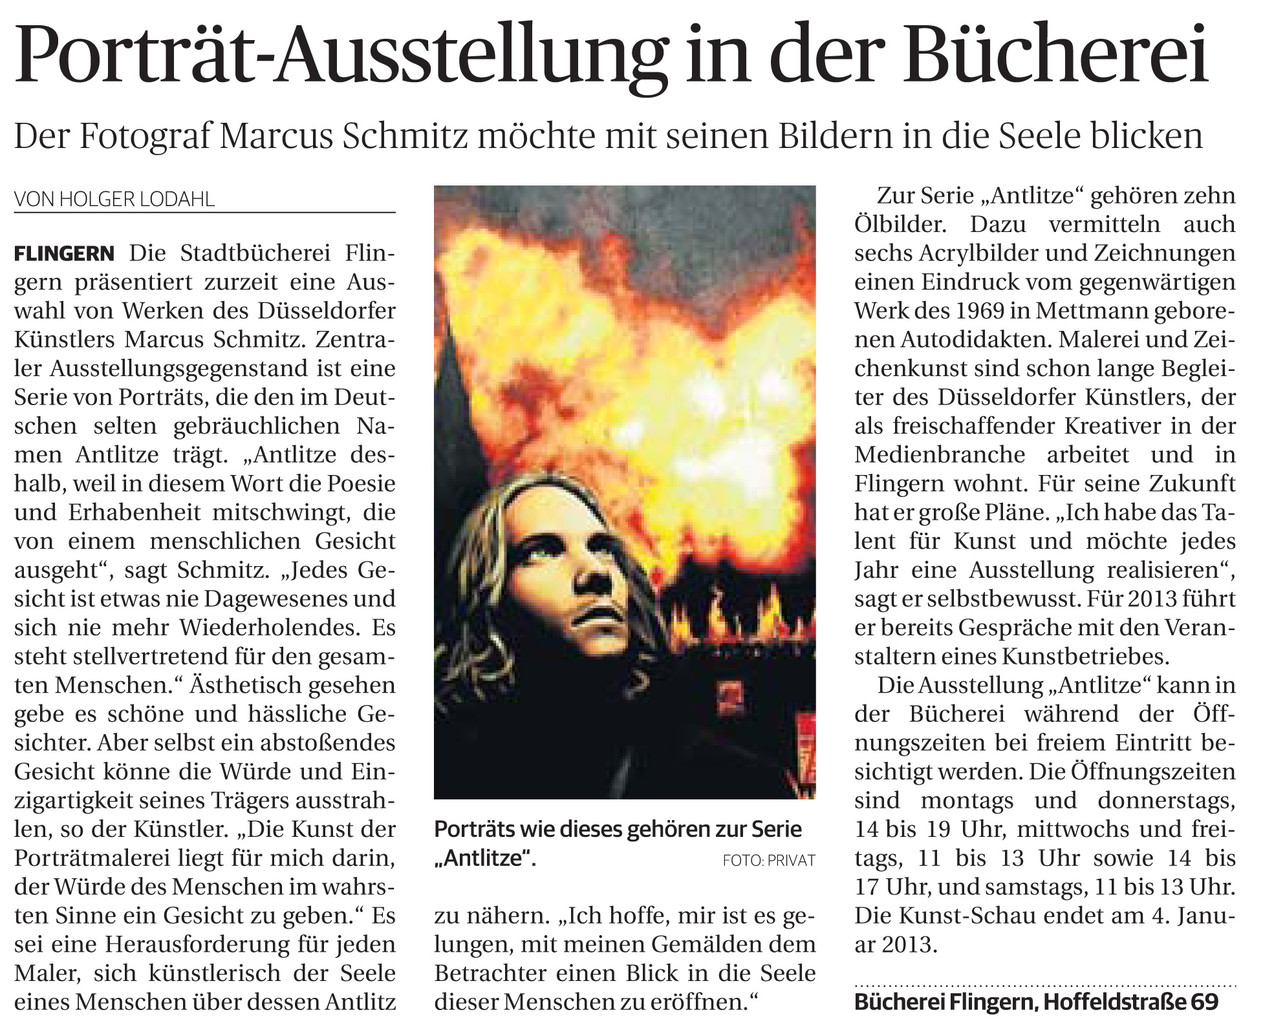 © Rheinische Post, Holger Lodahl, 23.11.2012